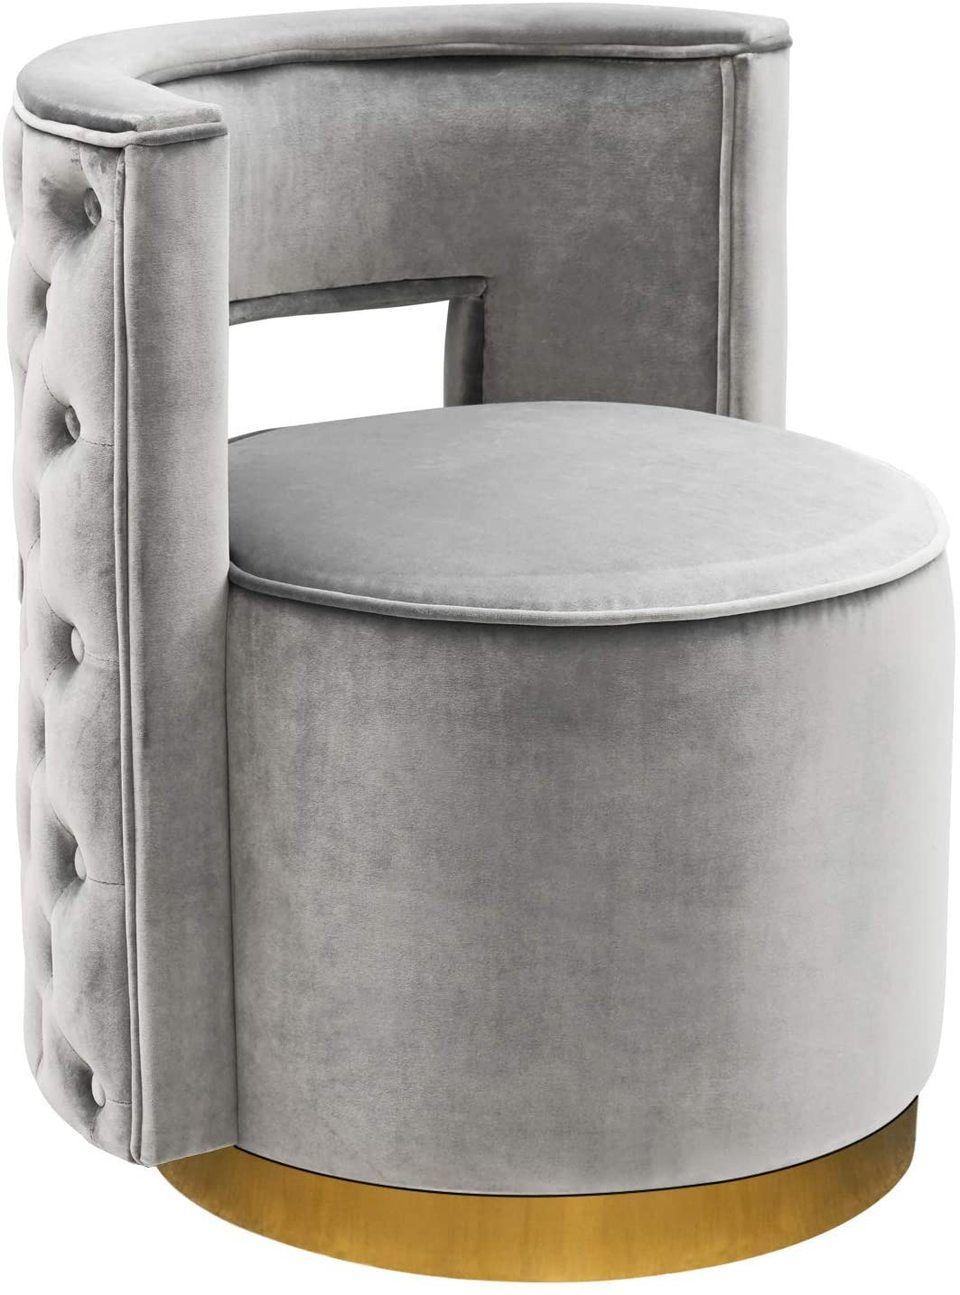 Homefun swivel vanity chair accent modern upholstered